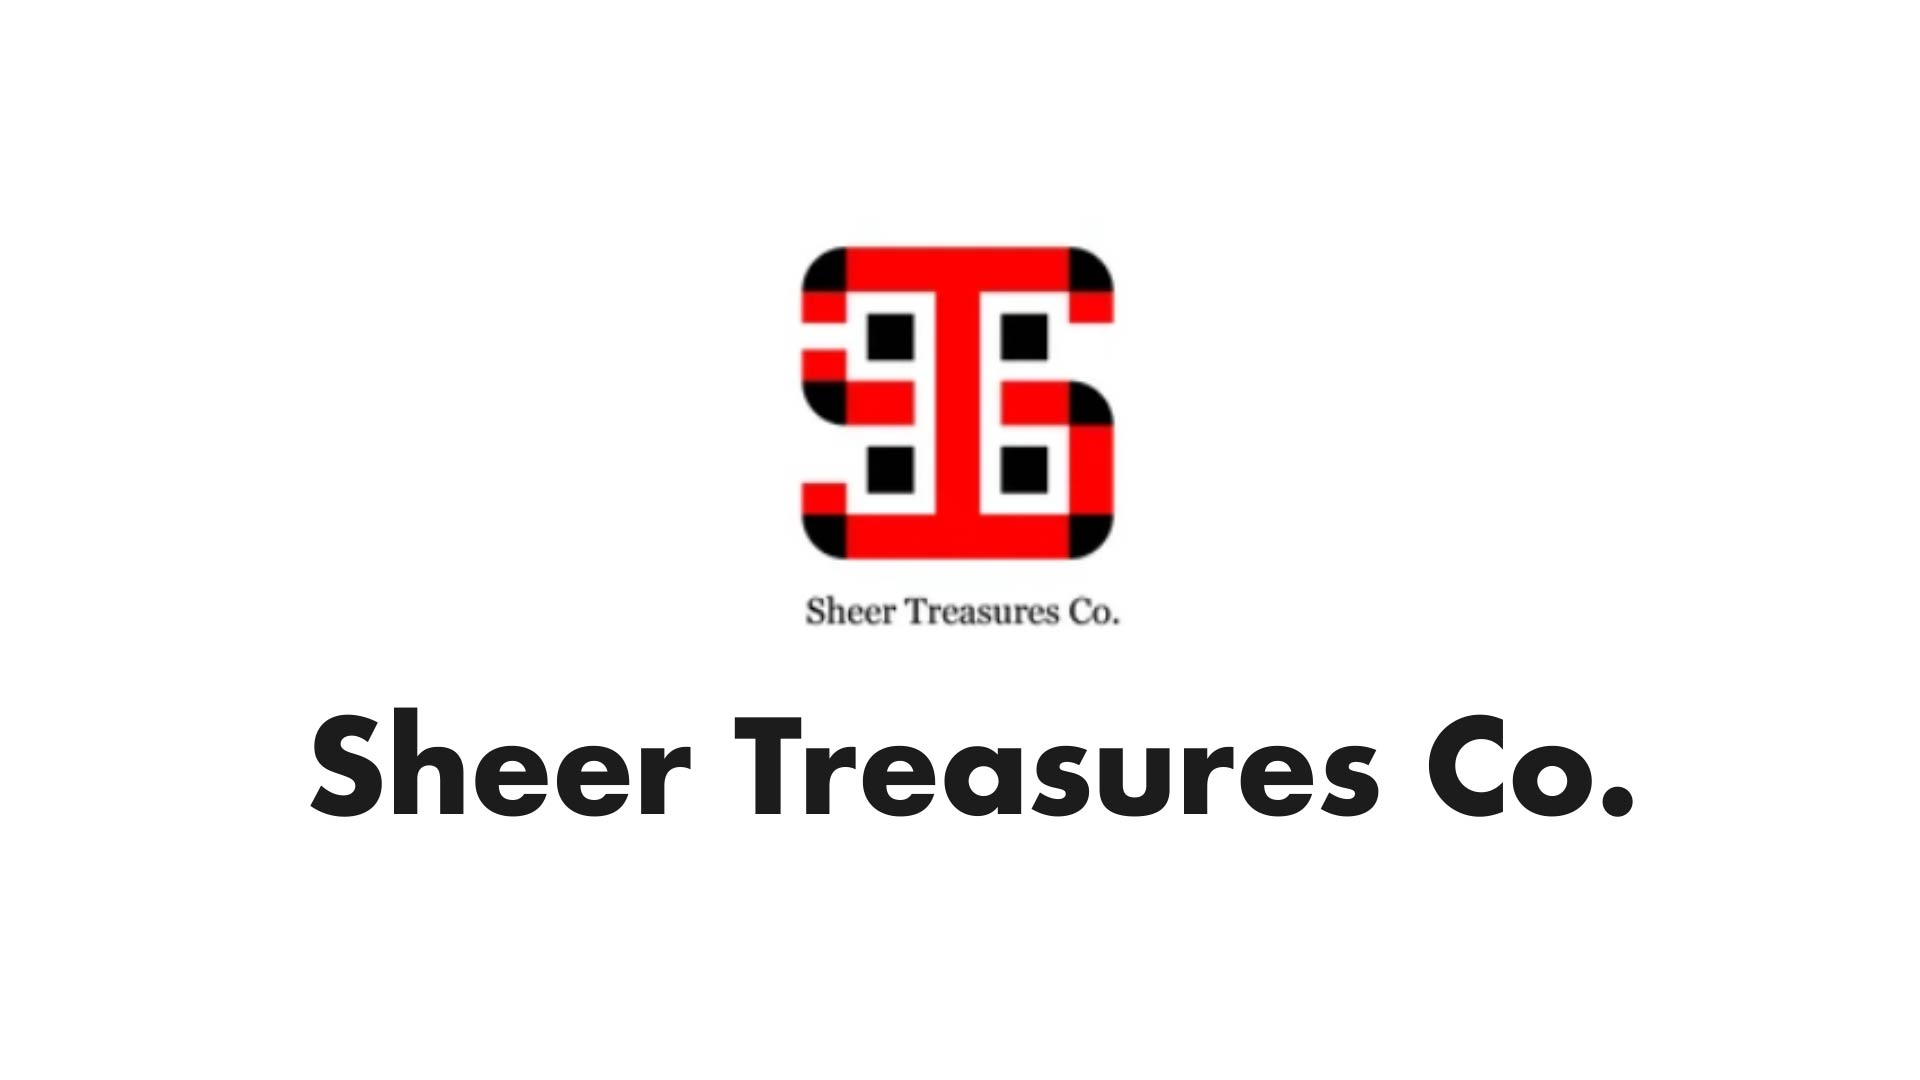 Sheer Treasures Co.